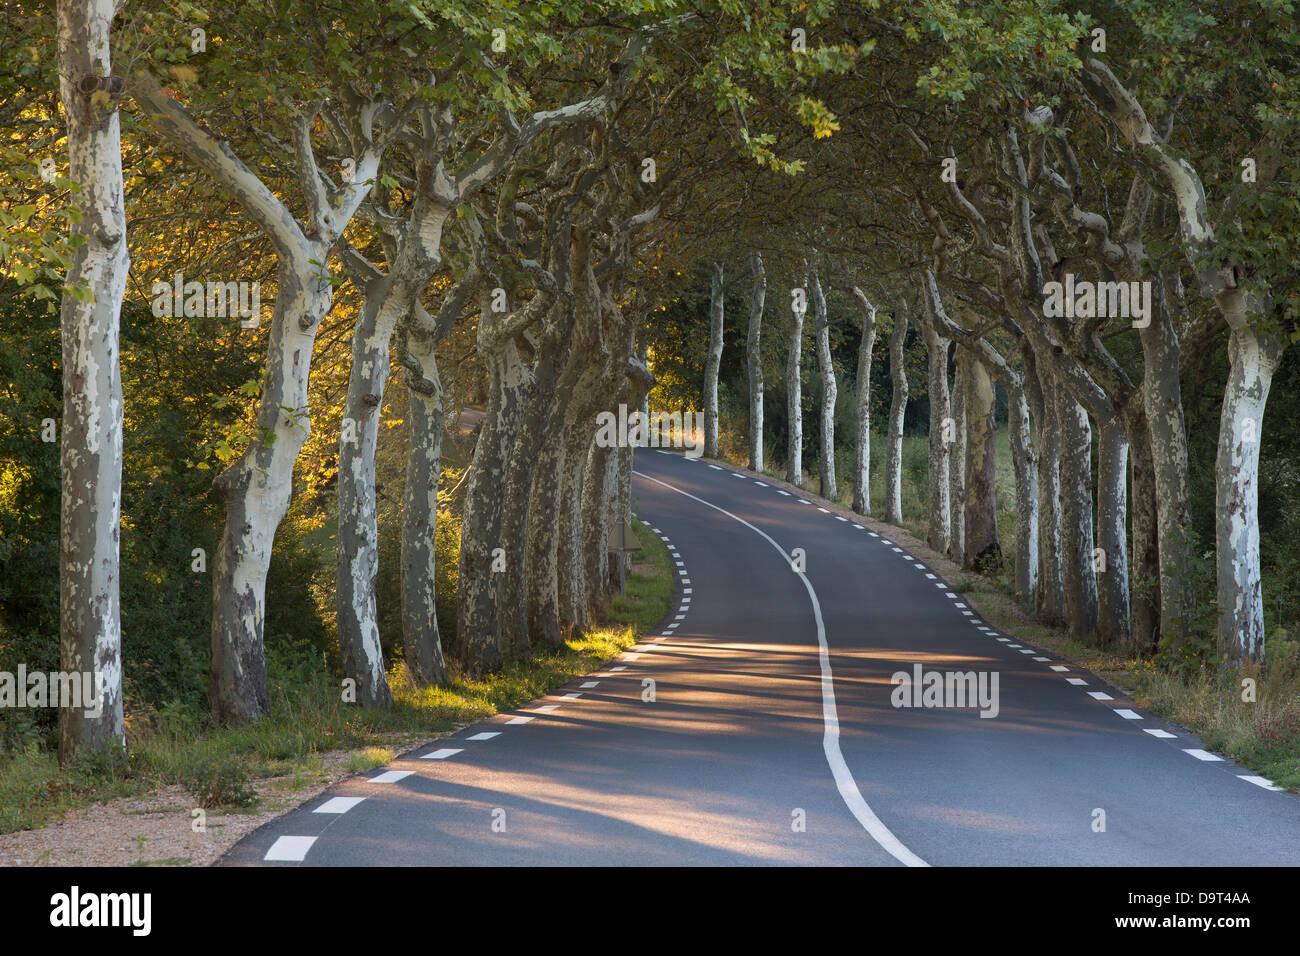 Una avenida de árboles normal en una carretera nr Soreze, Tarn, Languedoc, Francia Imagen De Stock